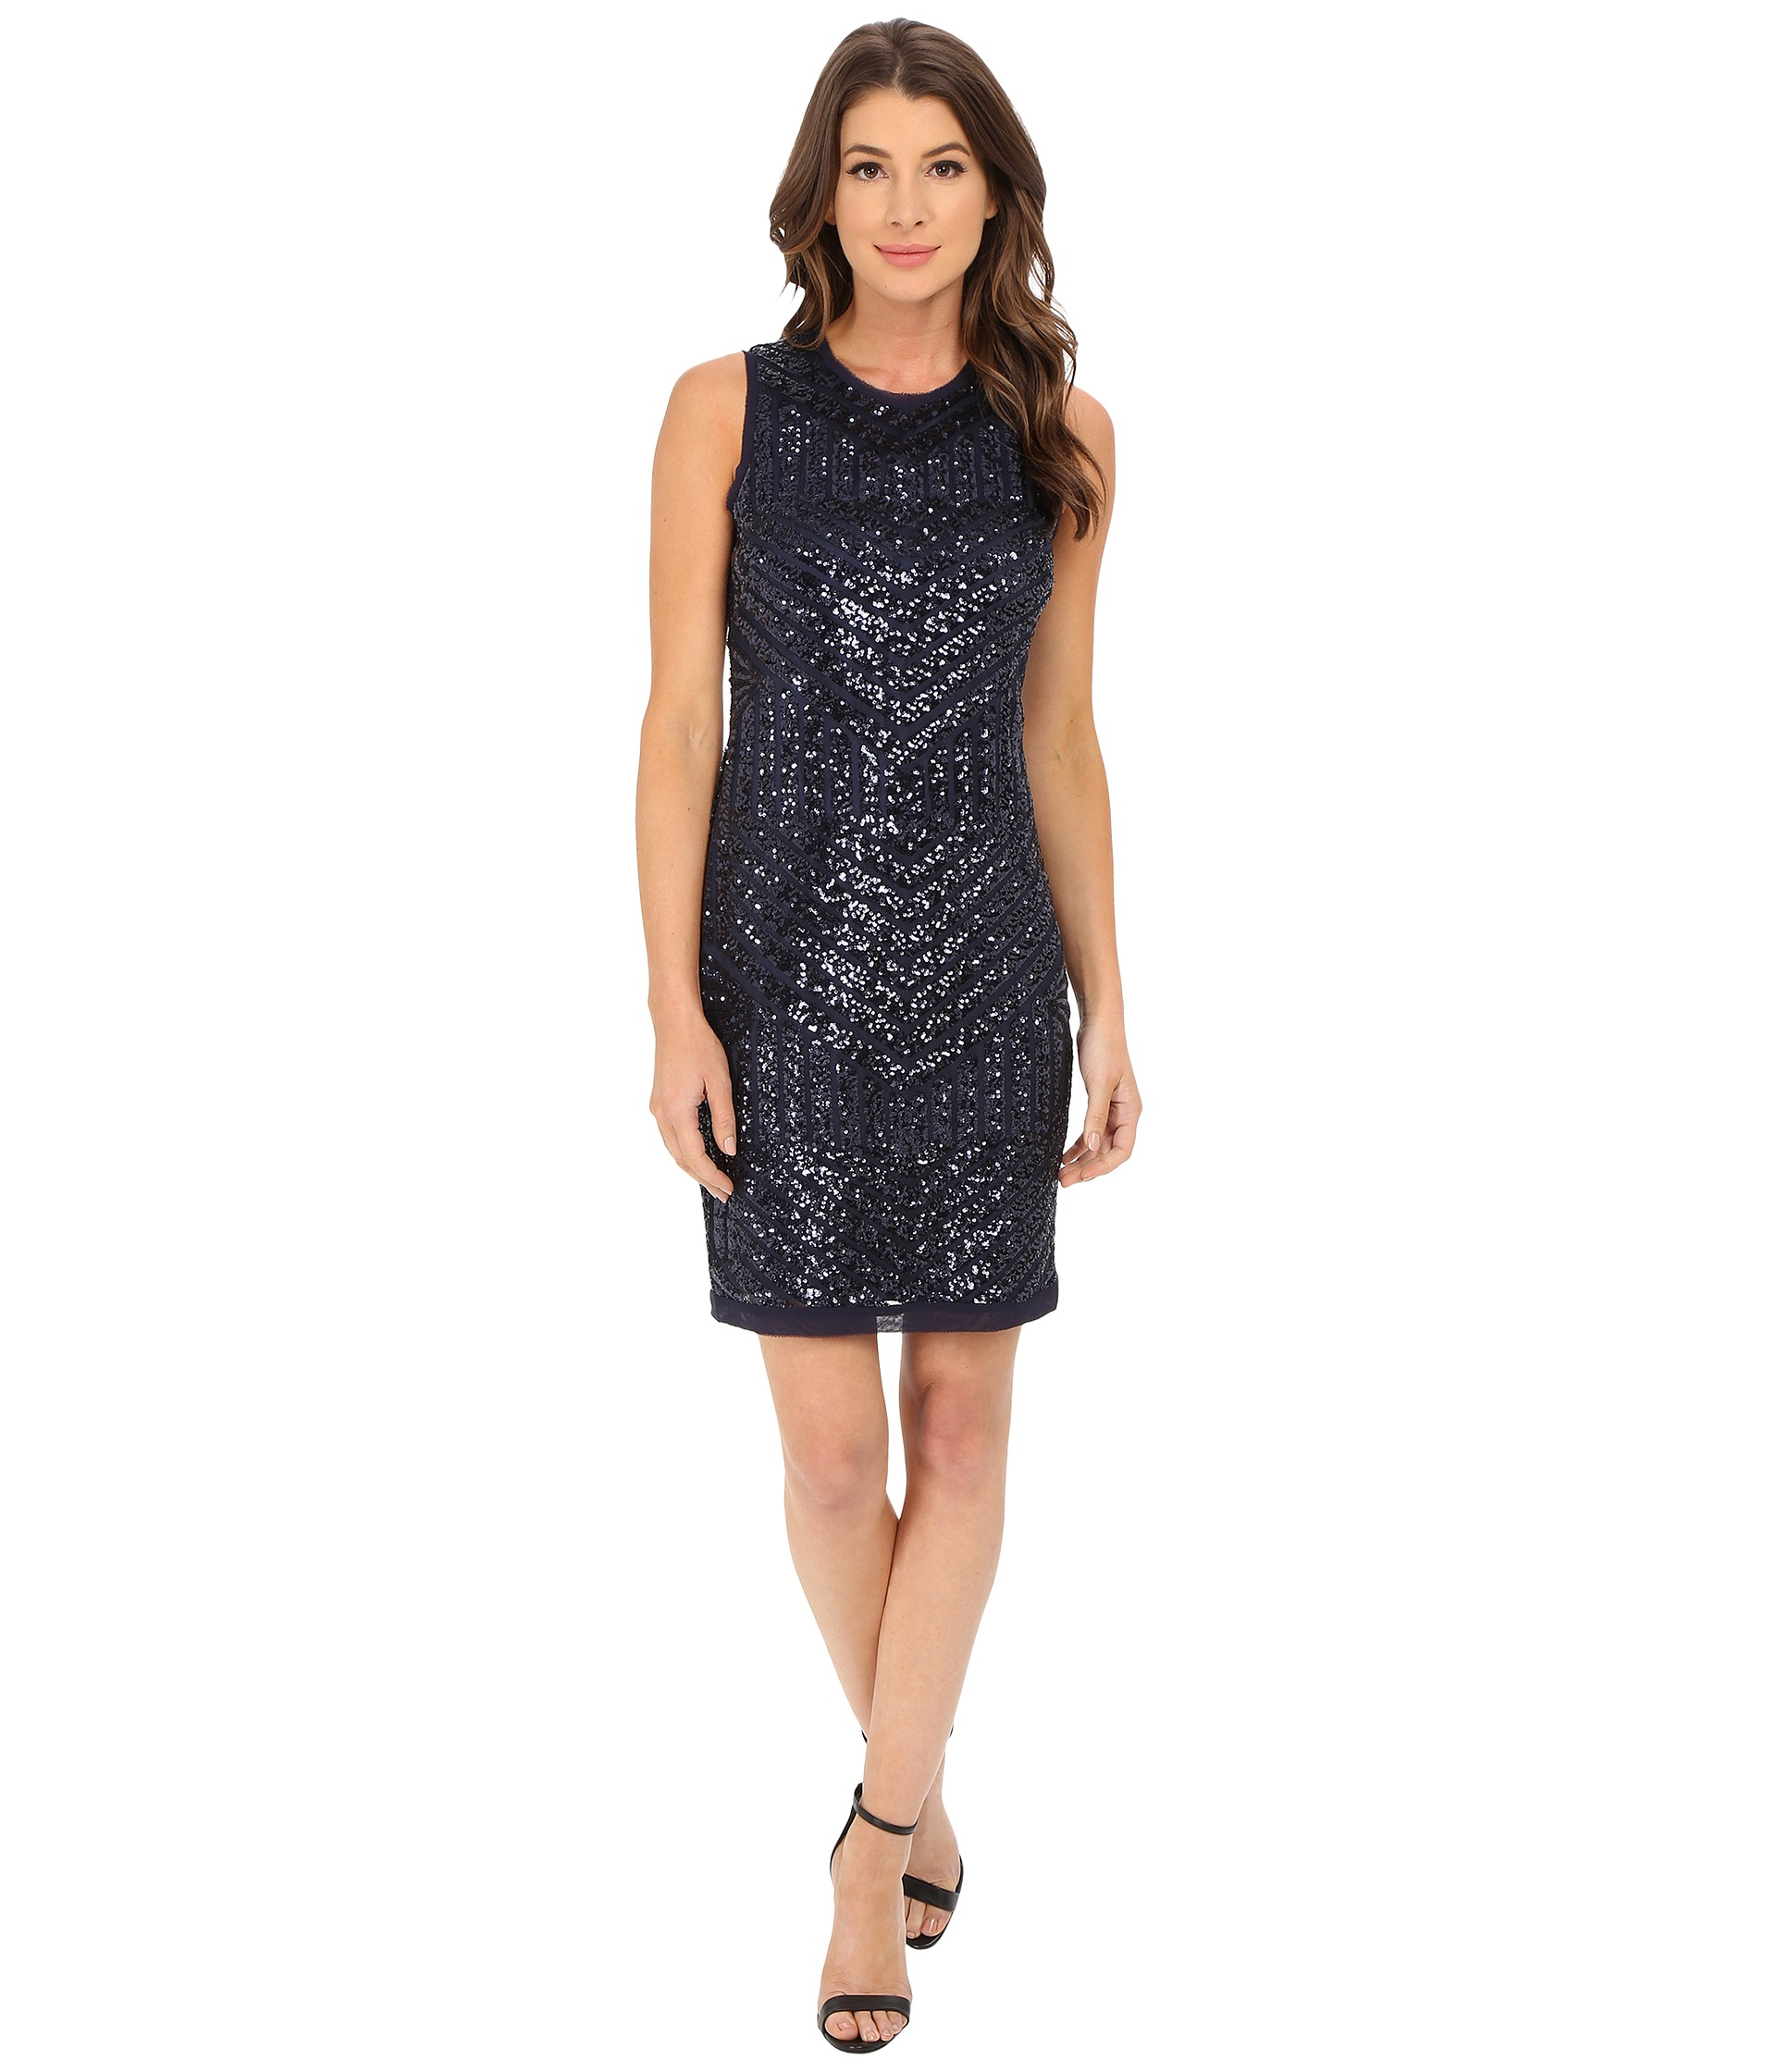 a0e9f54f6e7 Vince Camuto Geo Sequin Sheath Dress in Blue - Lyst